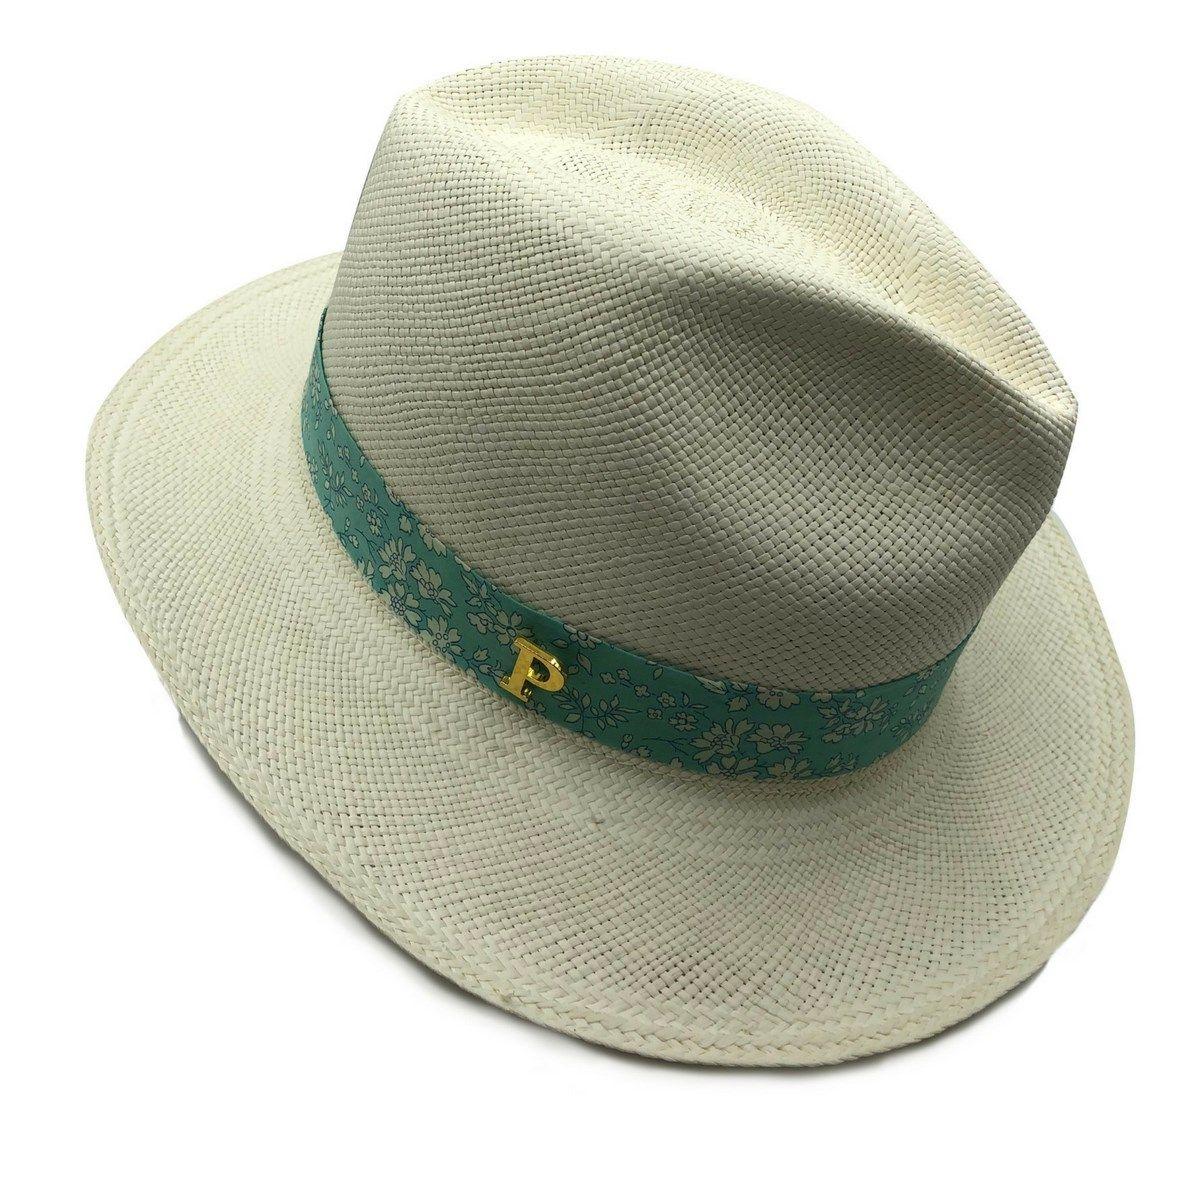 Chapeau Panama en paille écrue ruban interchangeable Liberty capel bleu